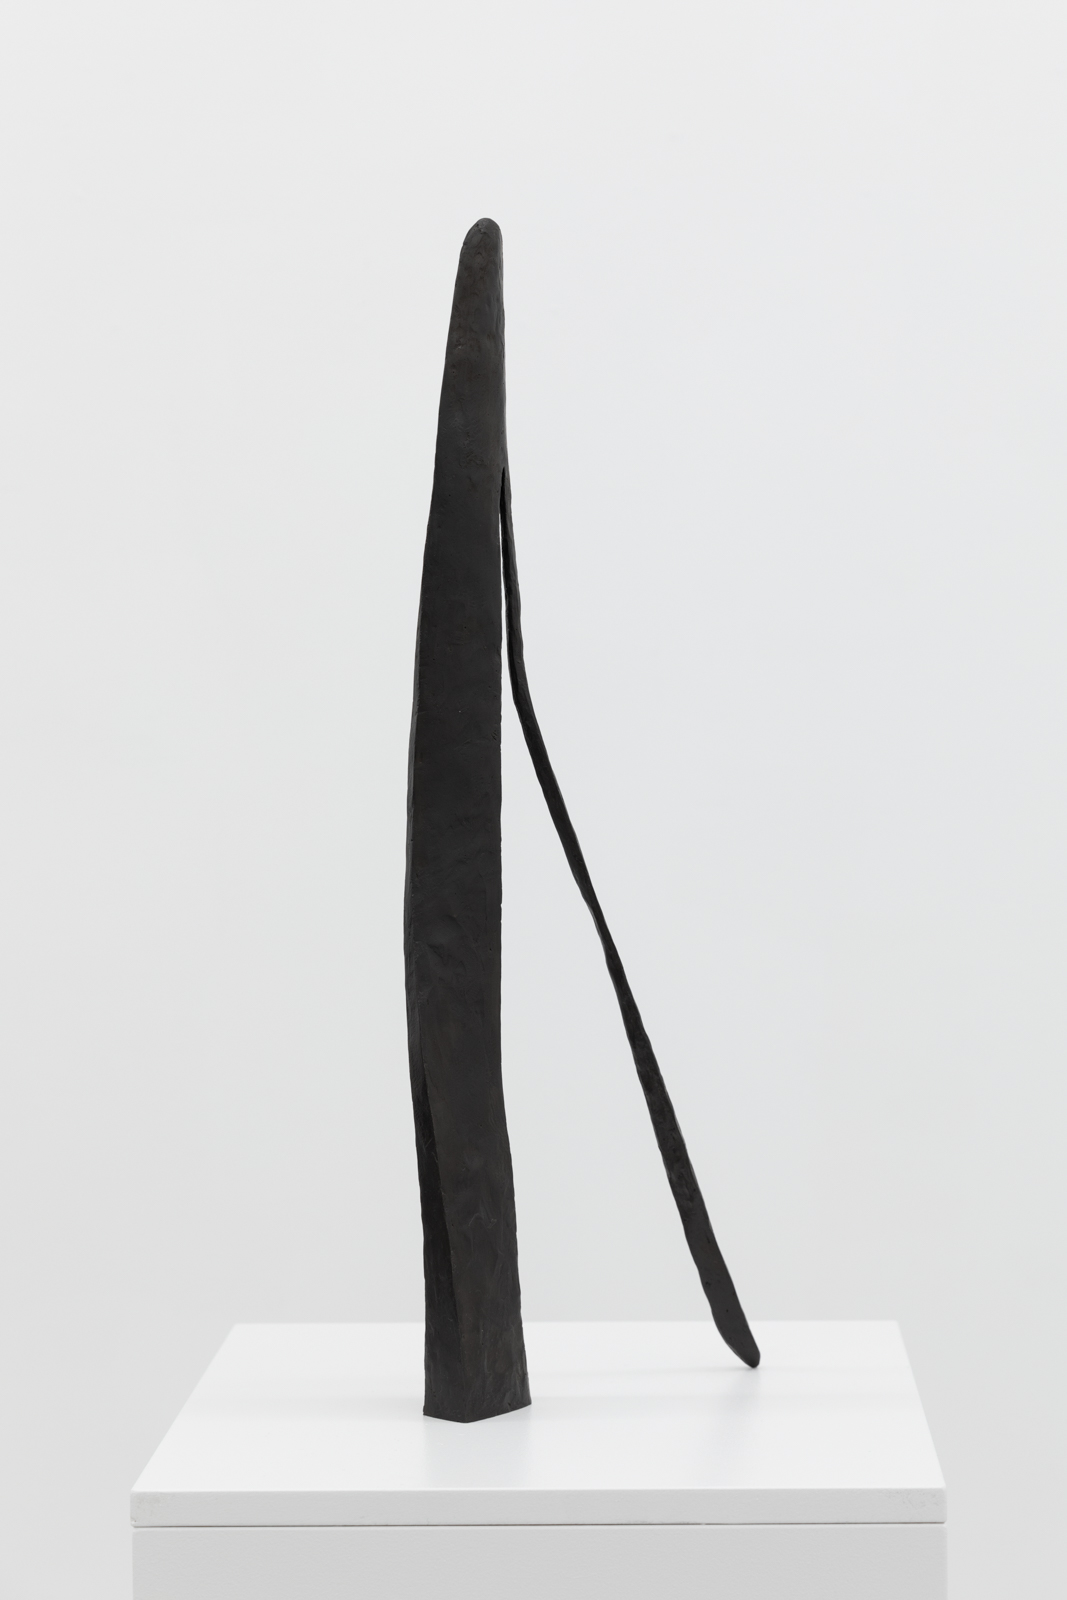 Sculpture II, 2019. Patinated bronze, H 56 x W 18,7 x D 4,2 cm, Ed. 5 + 1 AP